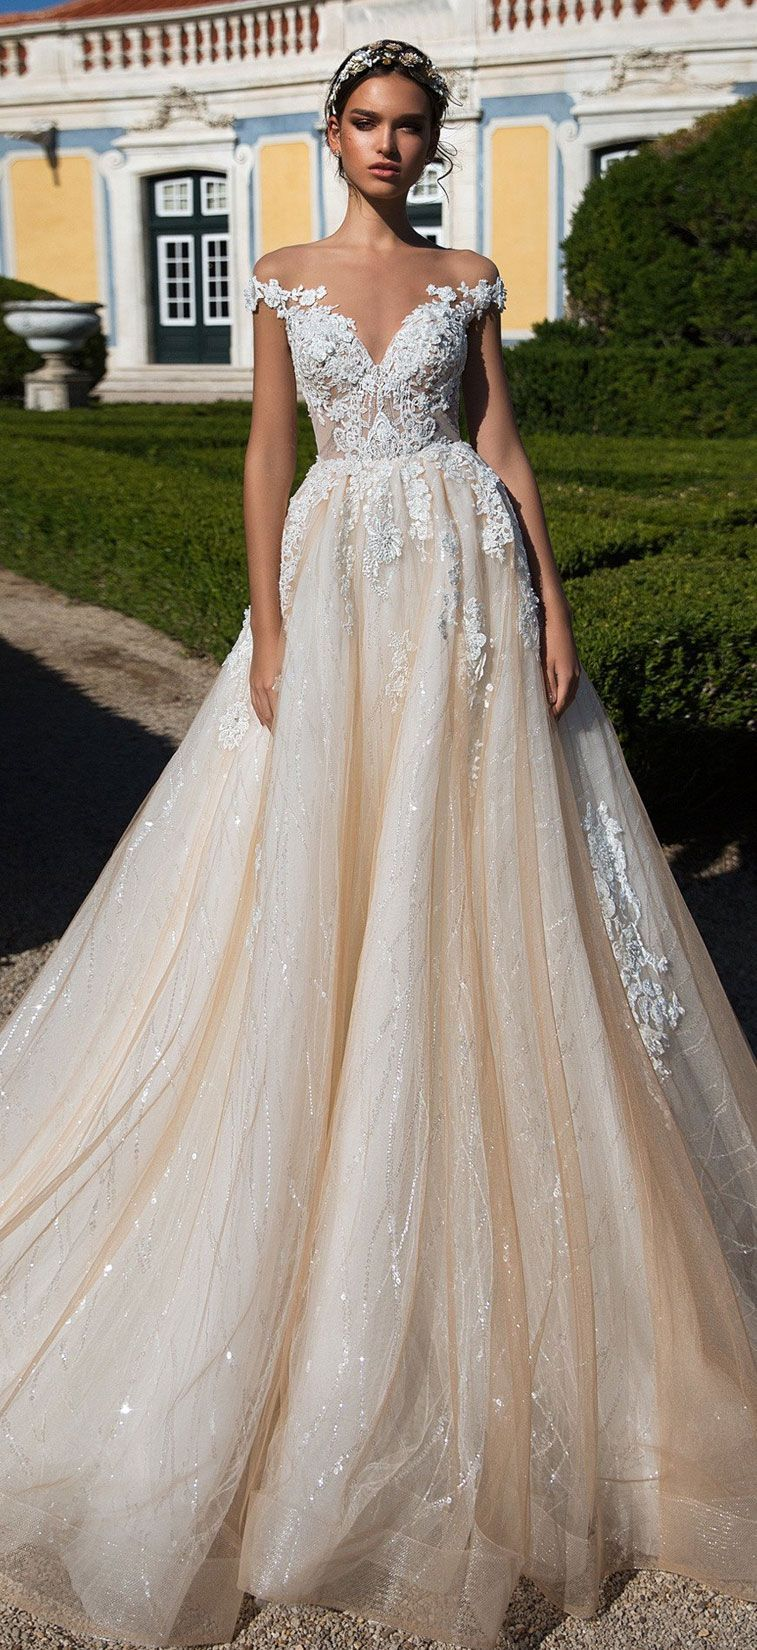 91dc231fc9 Off the shoulder a line heavy embellishment ball gown wedding dress   Milla  Nova wedding dress  weddingdress  weddinggown  wedding  bridedress